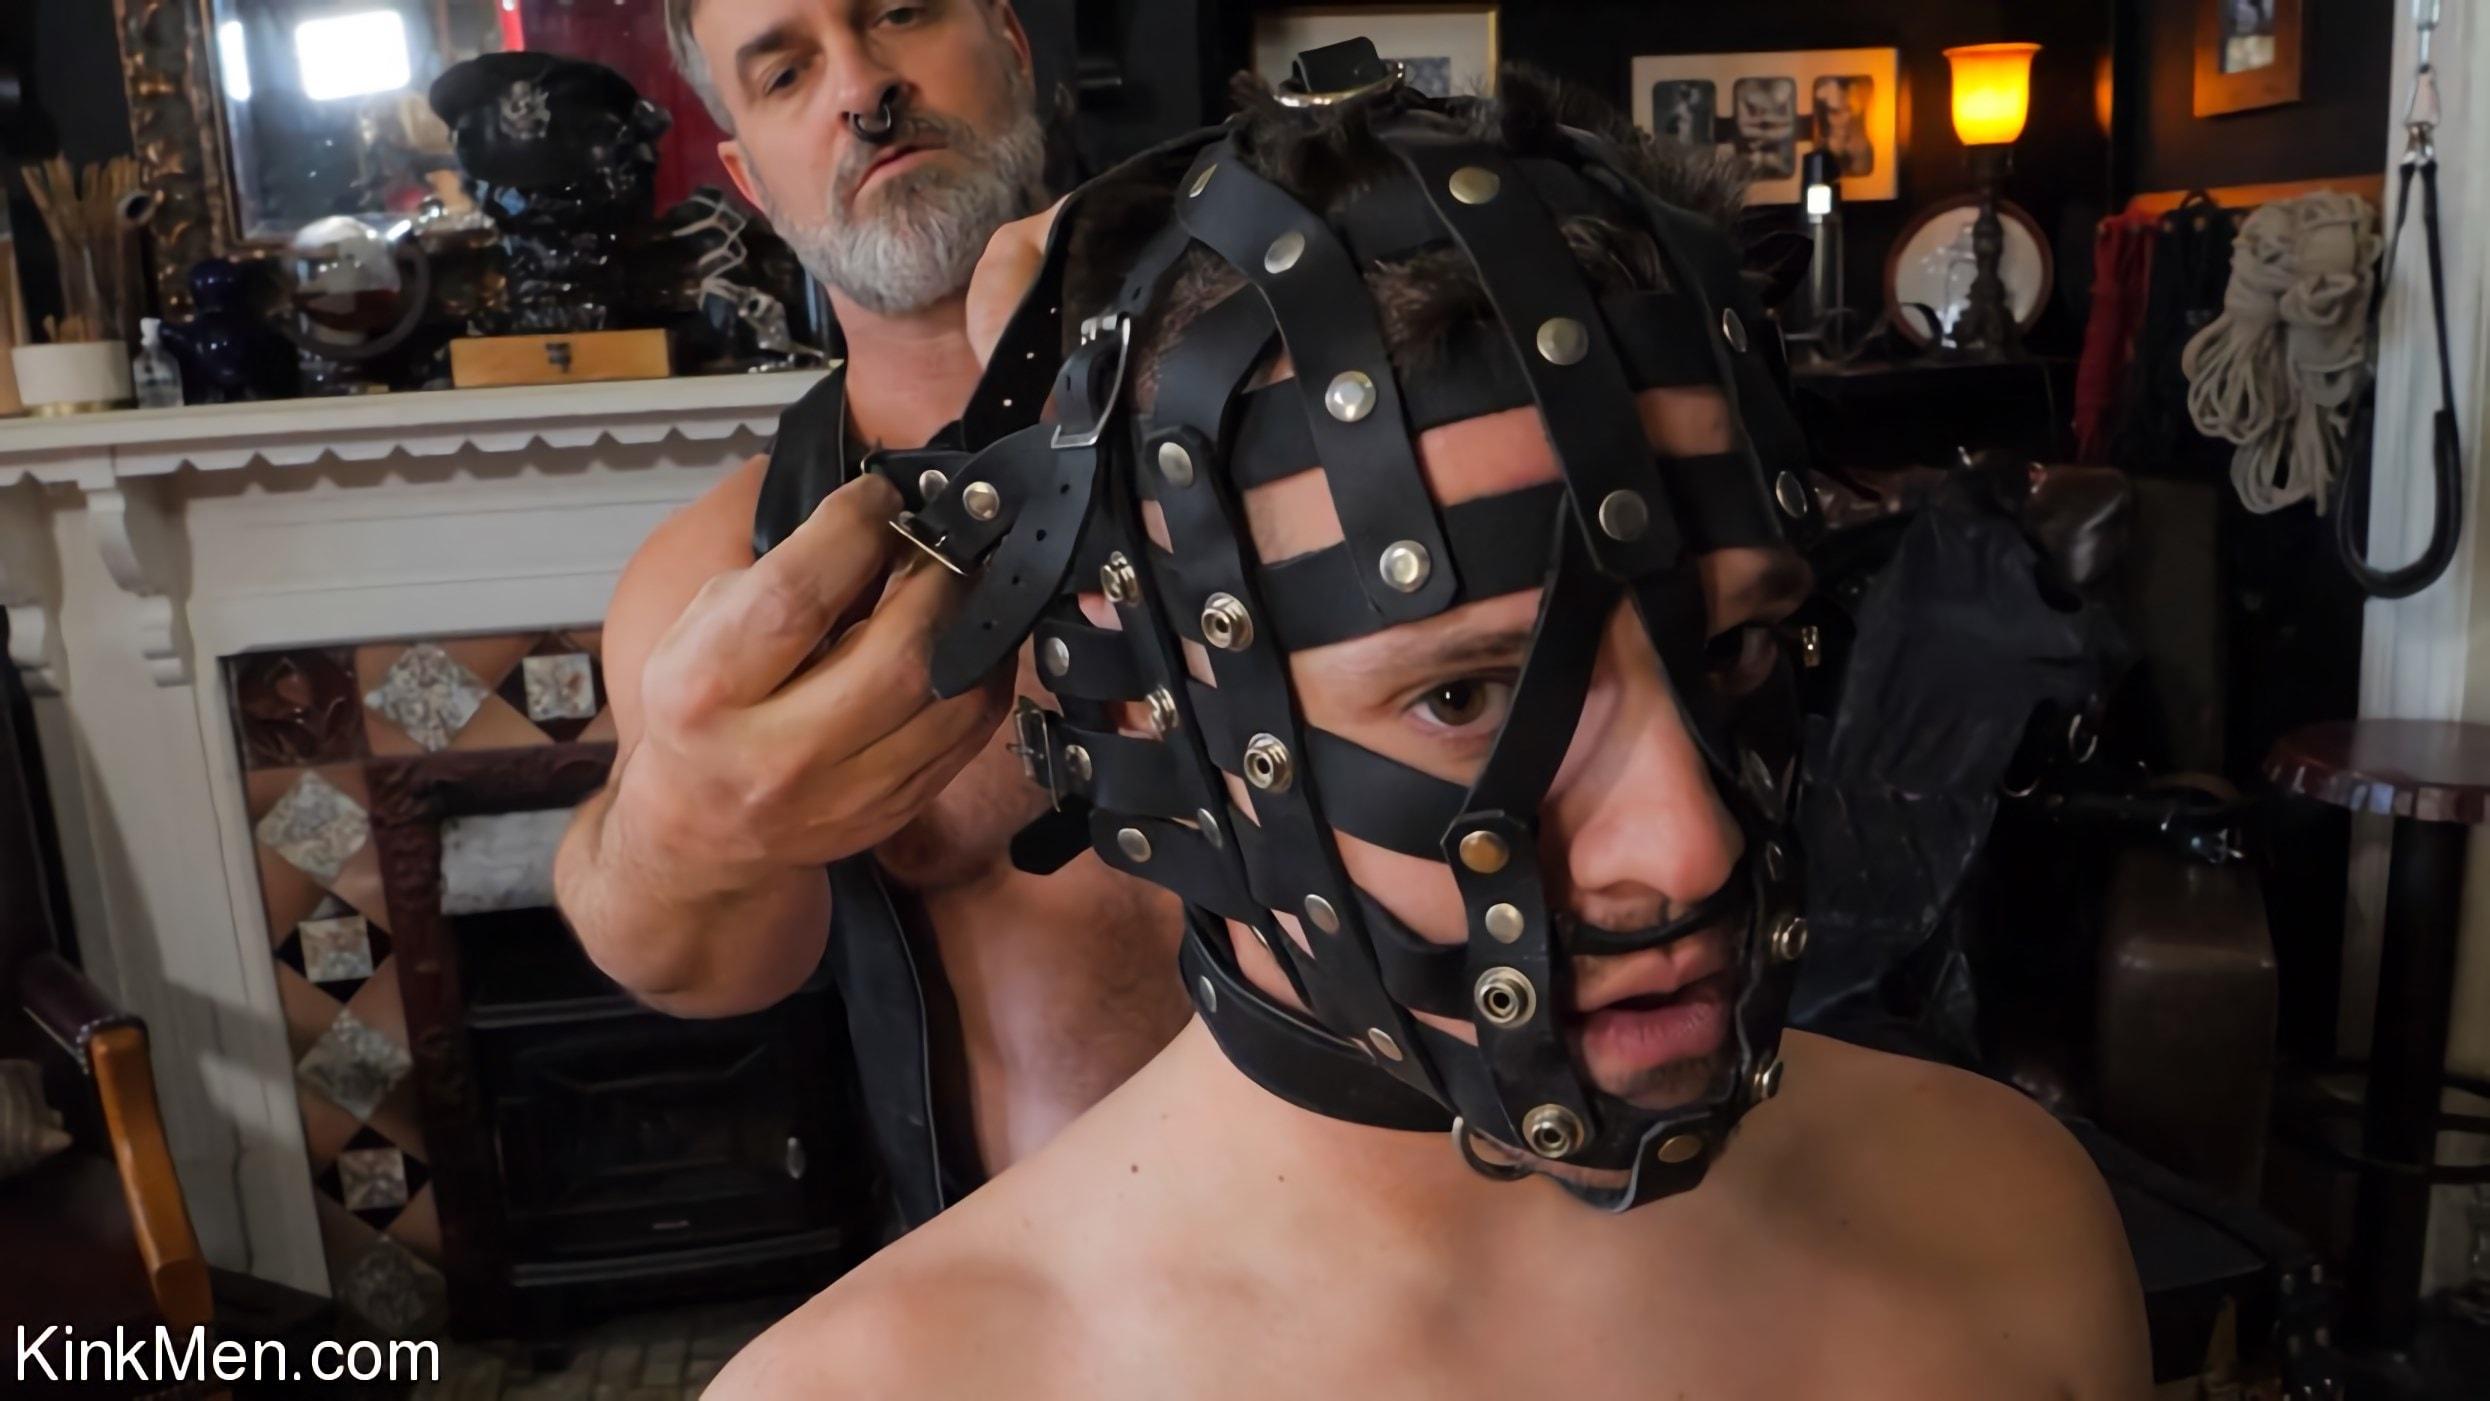 Kink Men 'The Suffering of Scott Ryder: Part Two' starring Kristofer Weston (Photo 1)